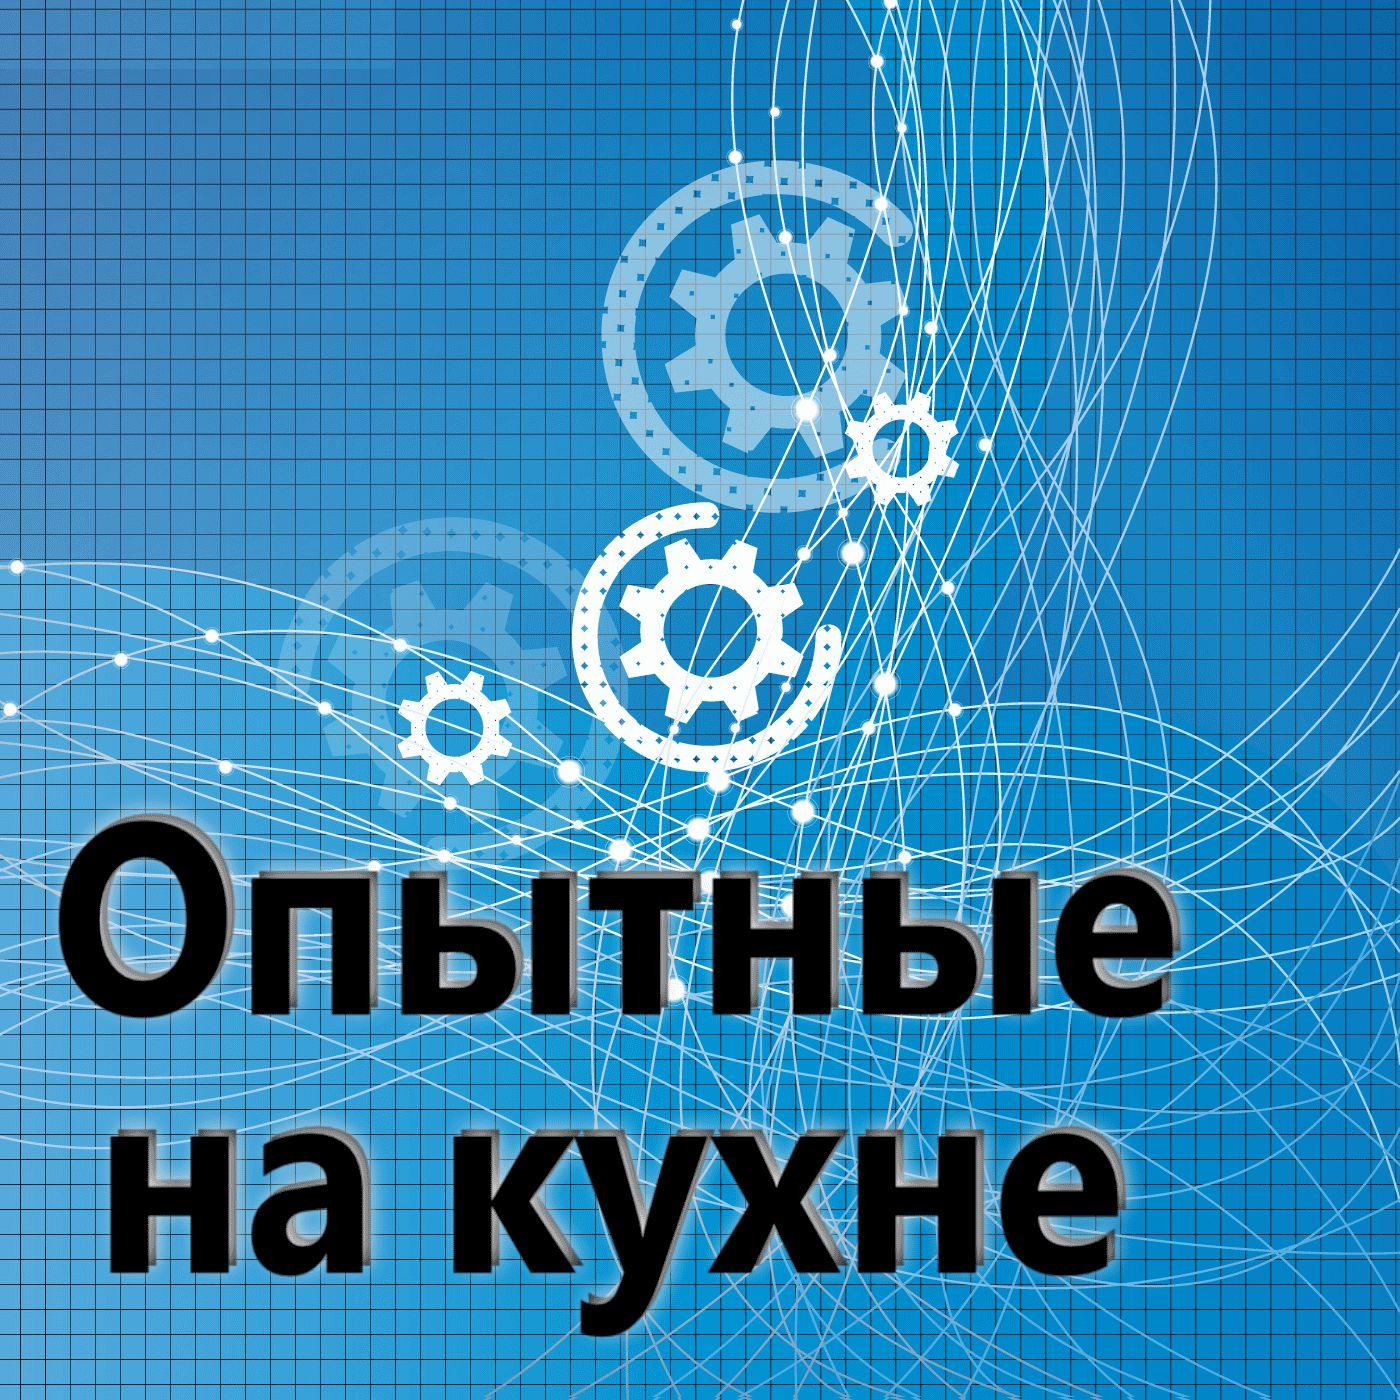 Евгений Плешивцев Опытные на кухне №080 https www butik ru